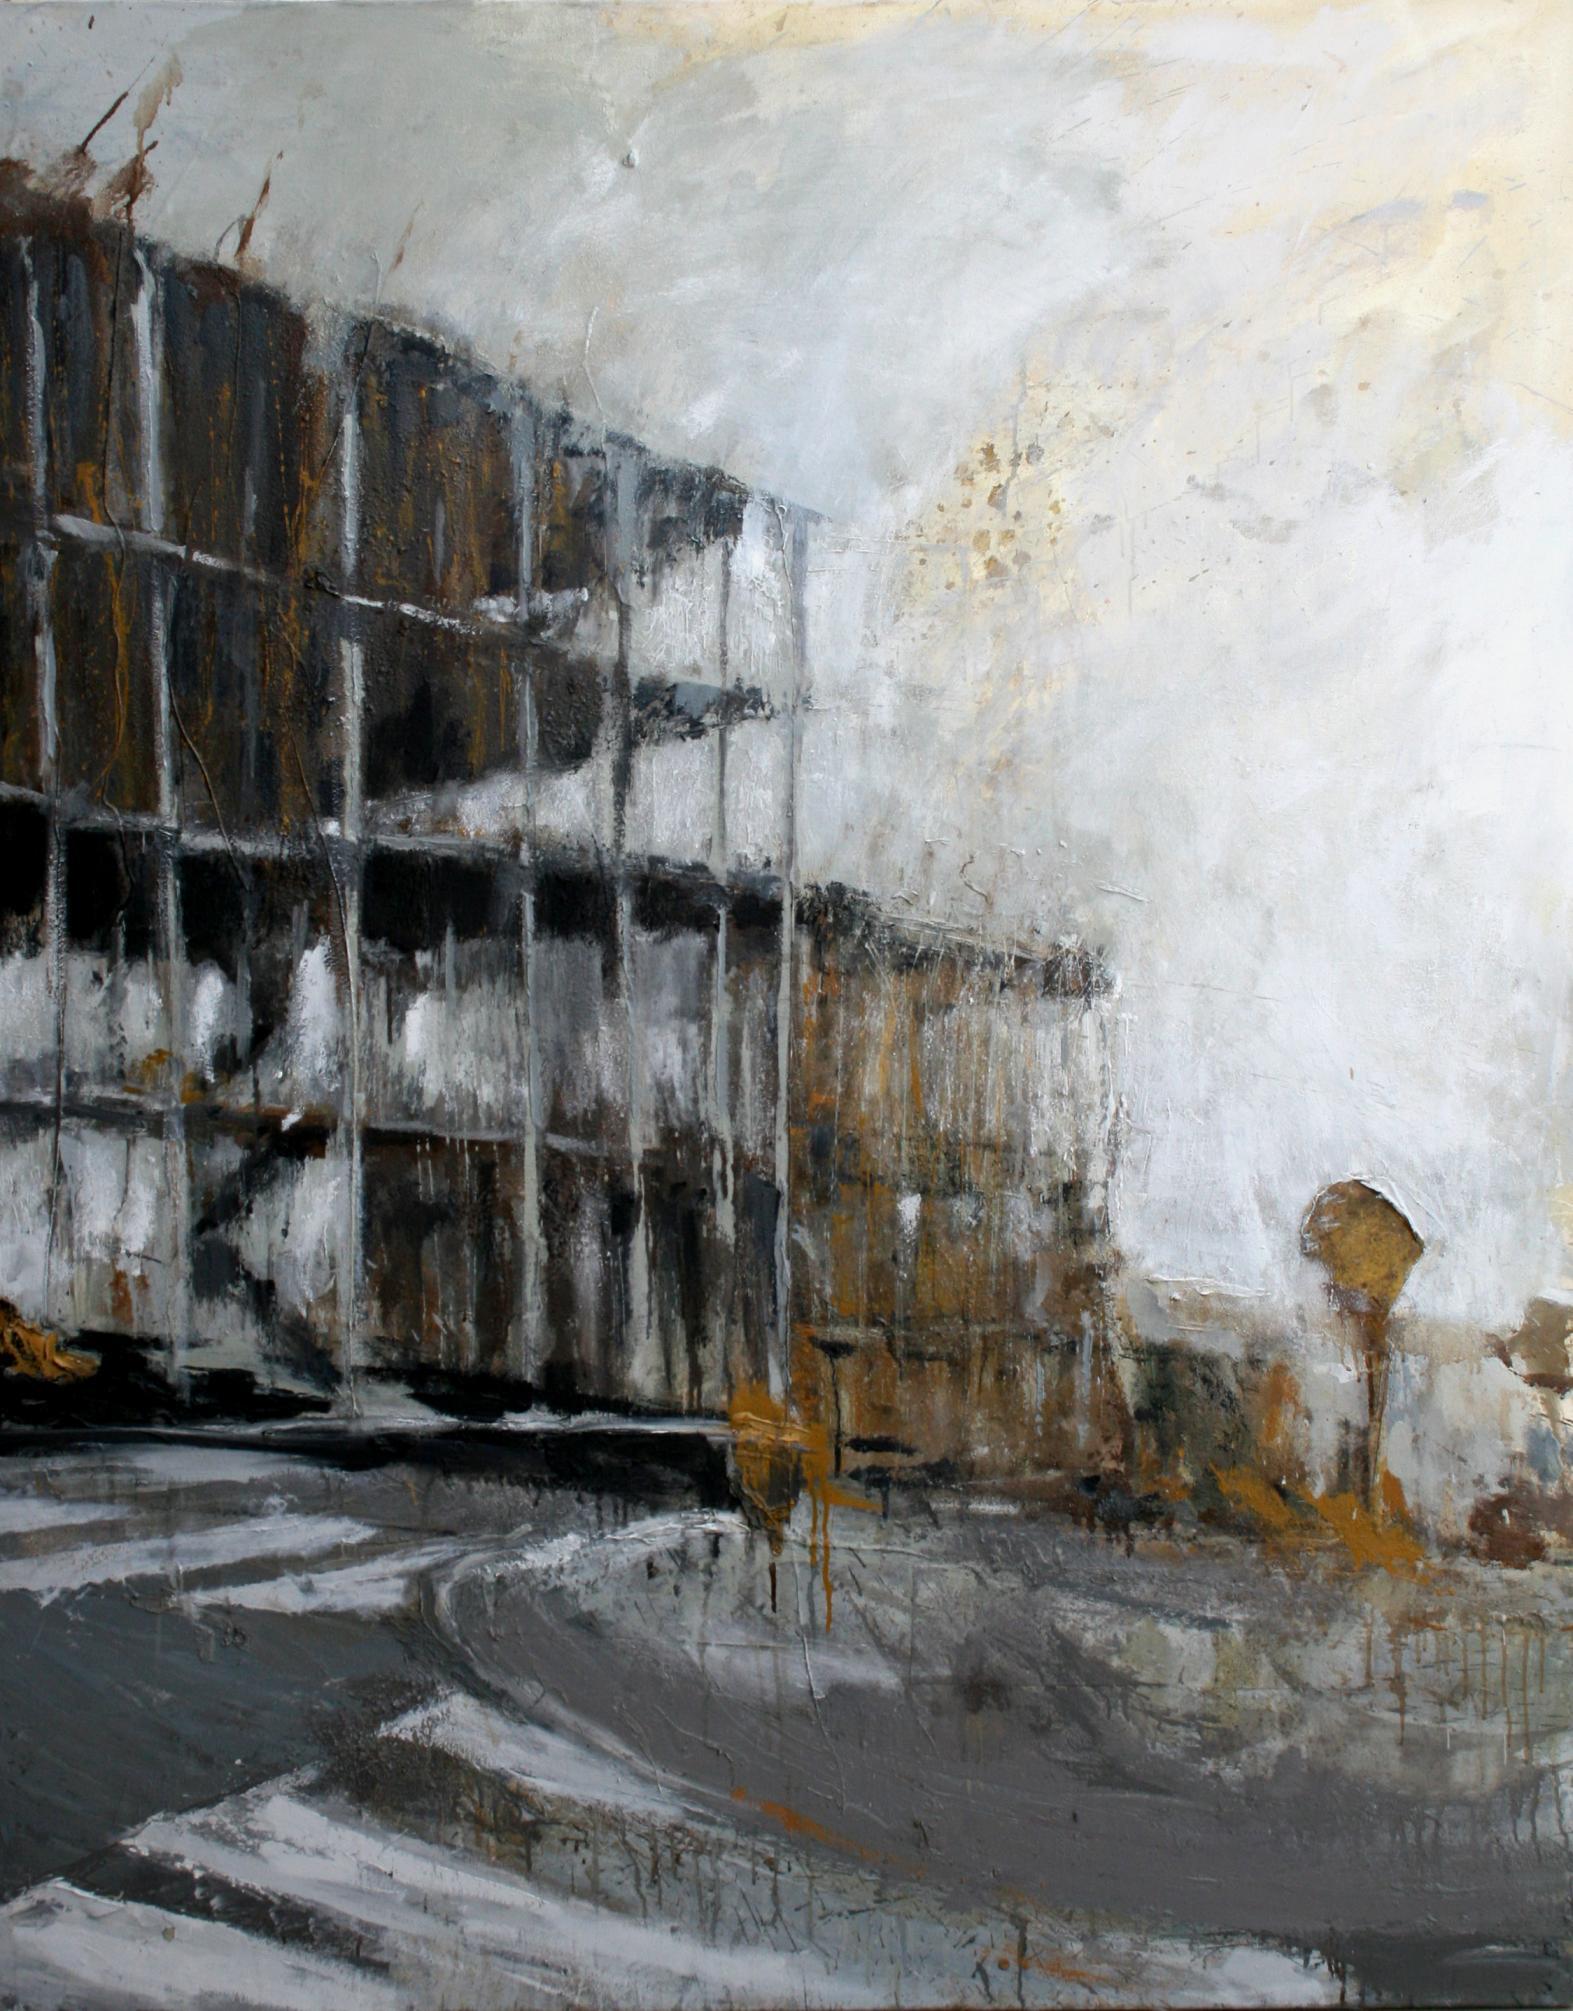 obra (2015) - Francisco García Corona